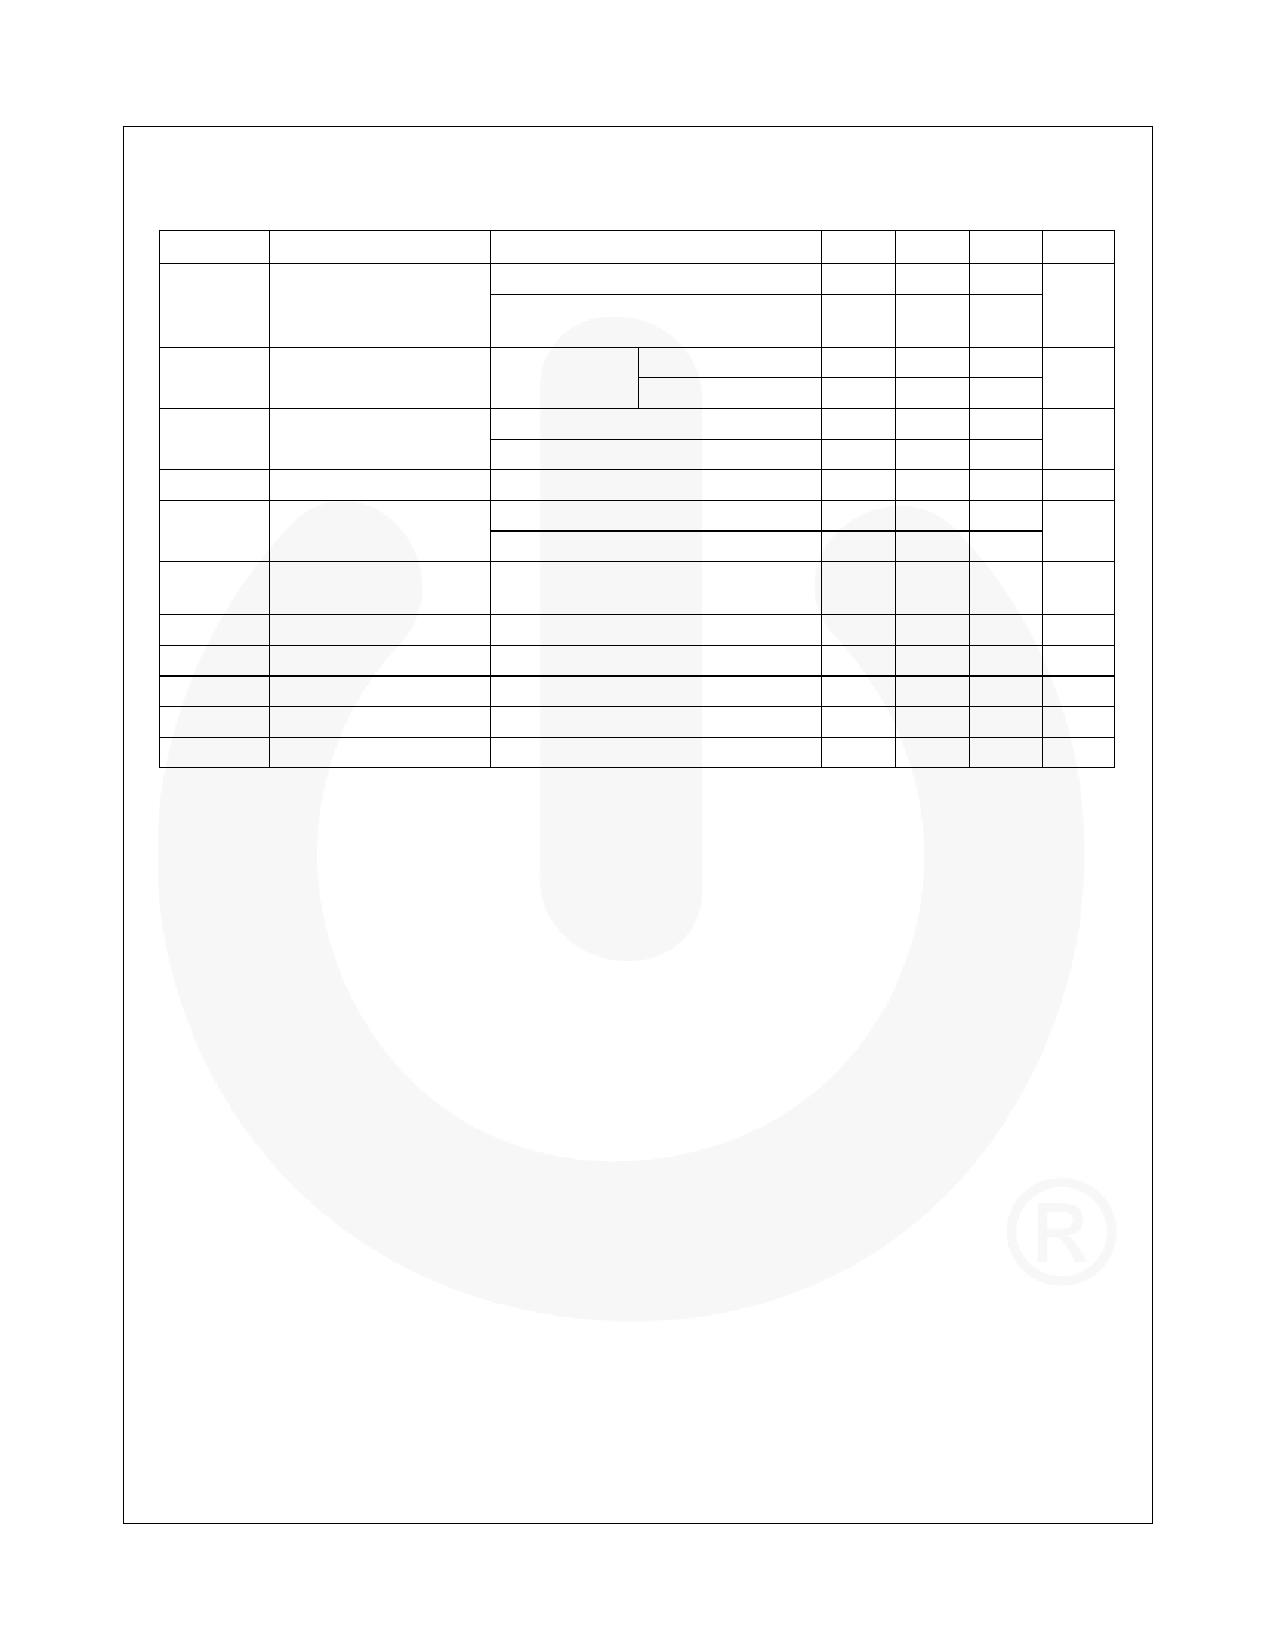 KA7909TU pdf, ピン配列